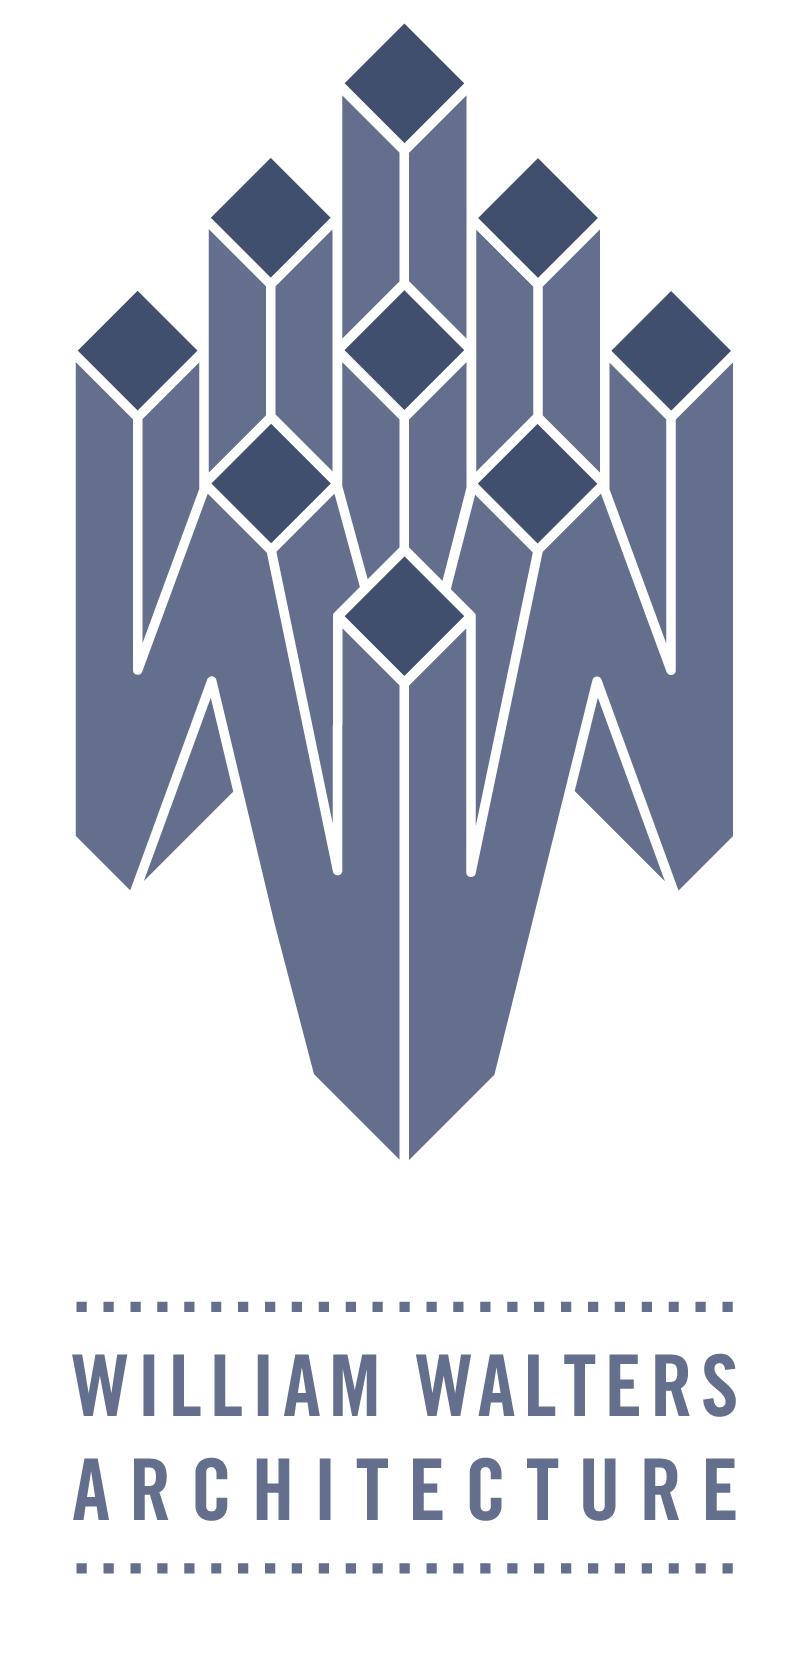 Logo Design, William Walters Architecture